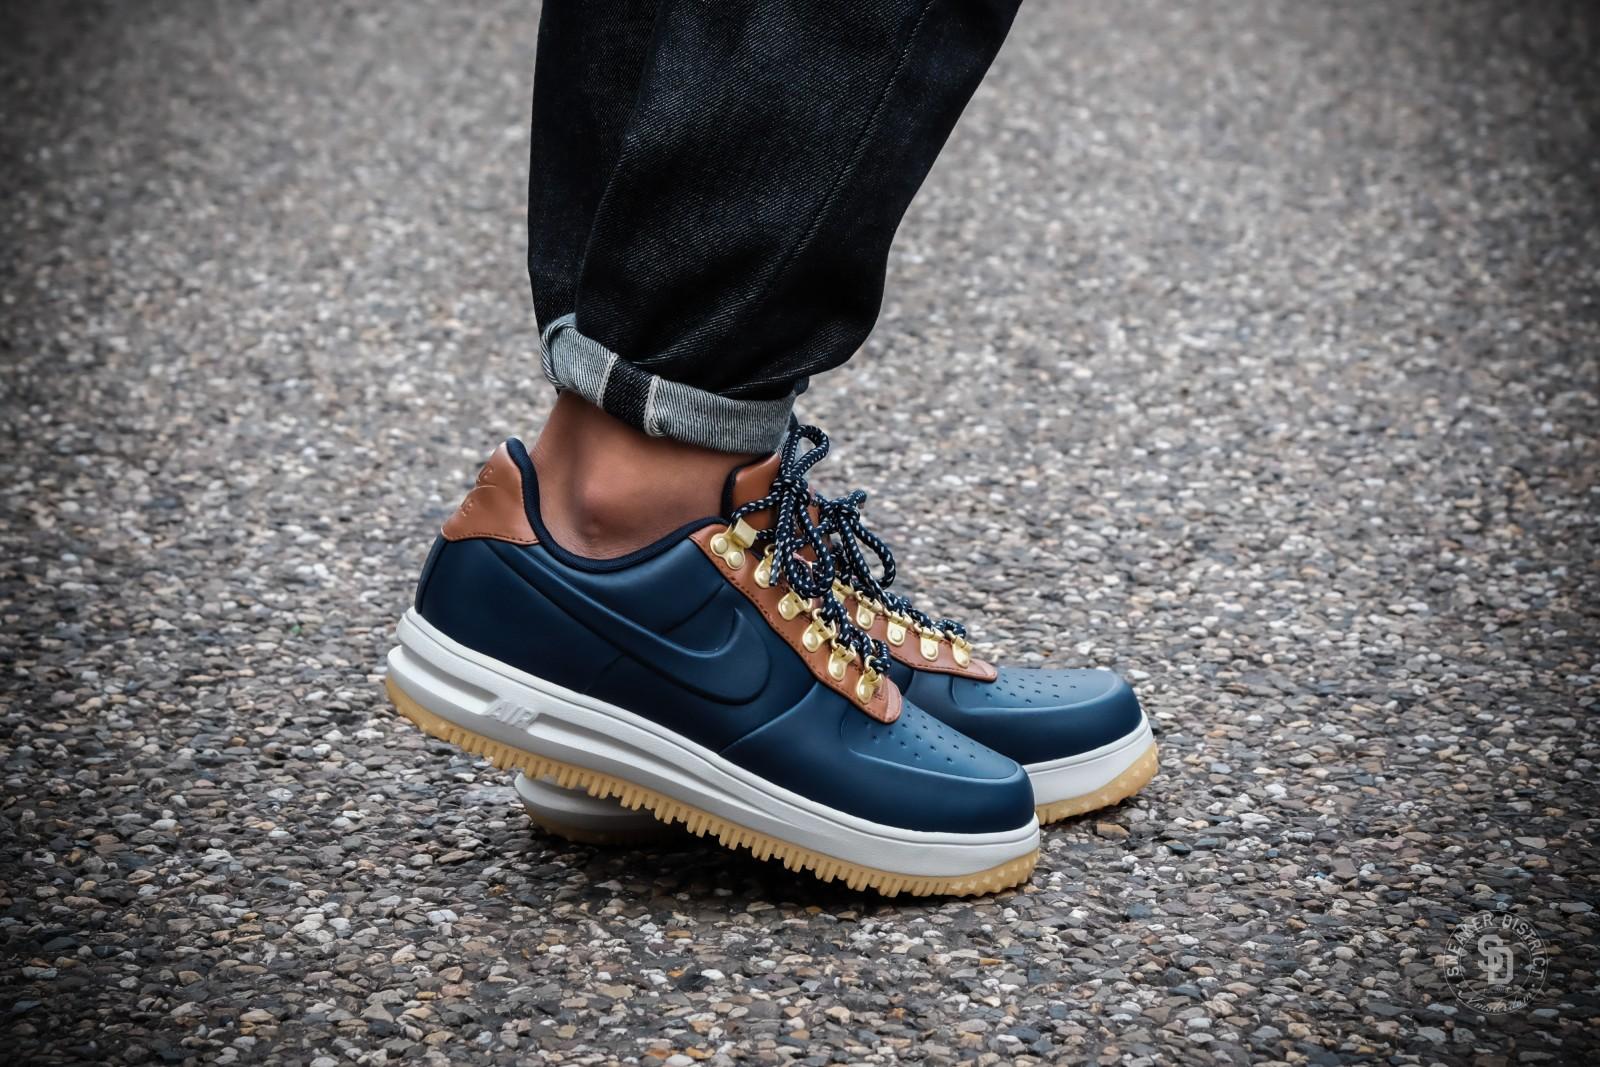 ... Nike Lunar Force 1 Low Duckboot ObsidianSaddle Brown sneakers Online  sneaker store Sneaker District ... be3998346